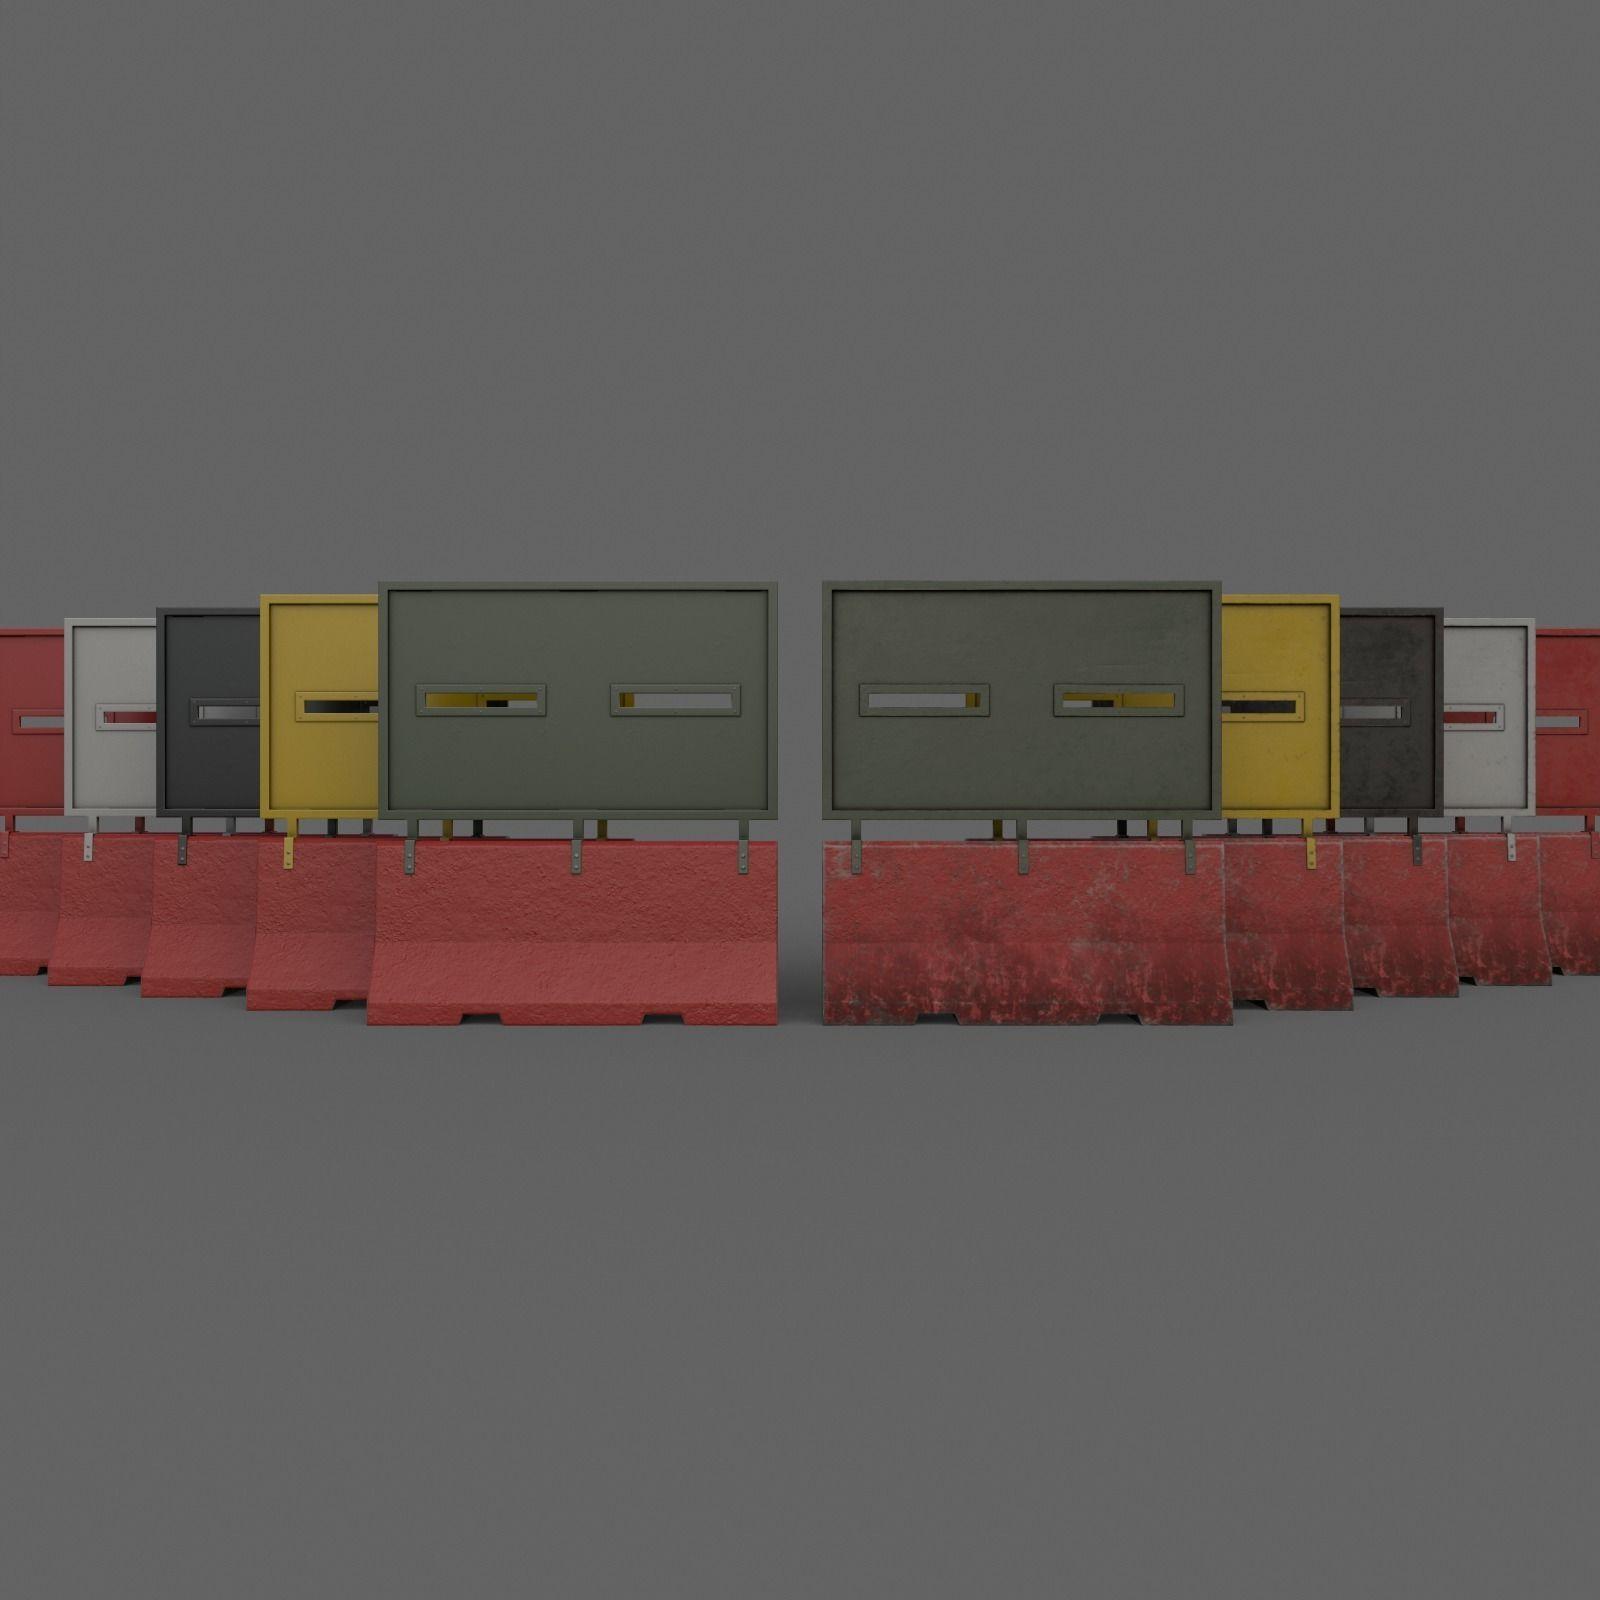 PBR Concrete Roadblock Barrier V4